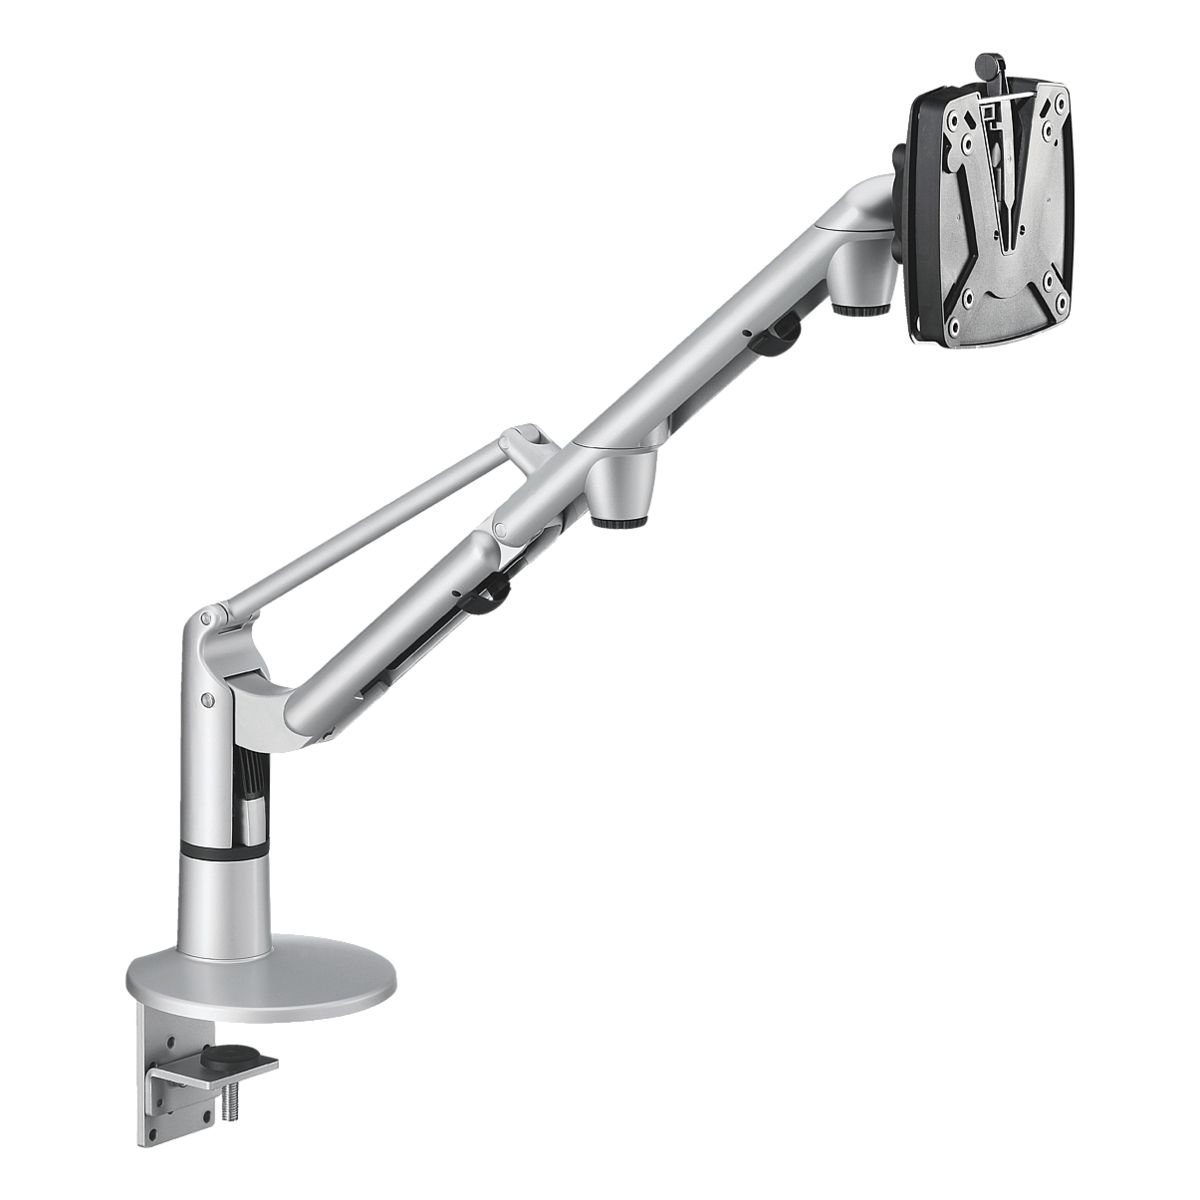 NOVUS 2-teiliger Monitortragarm (930+2159), mit Tischbefestigungen,... »NOVUS LiftTEC-Arm II«